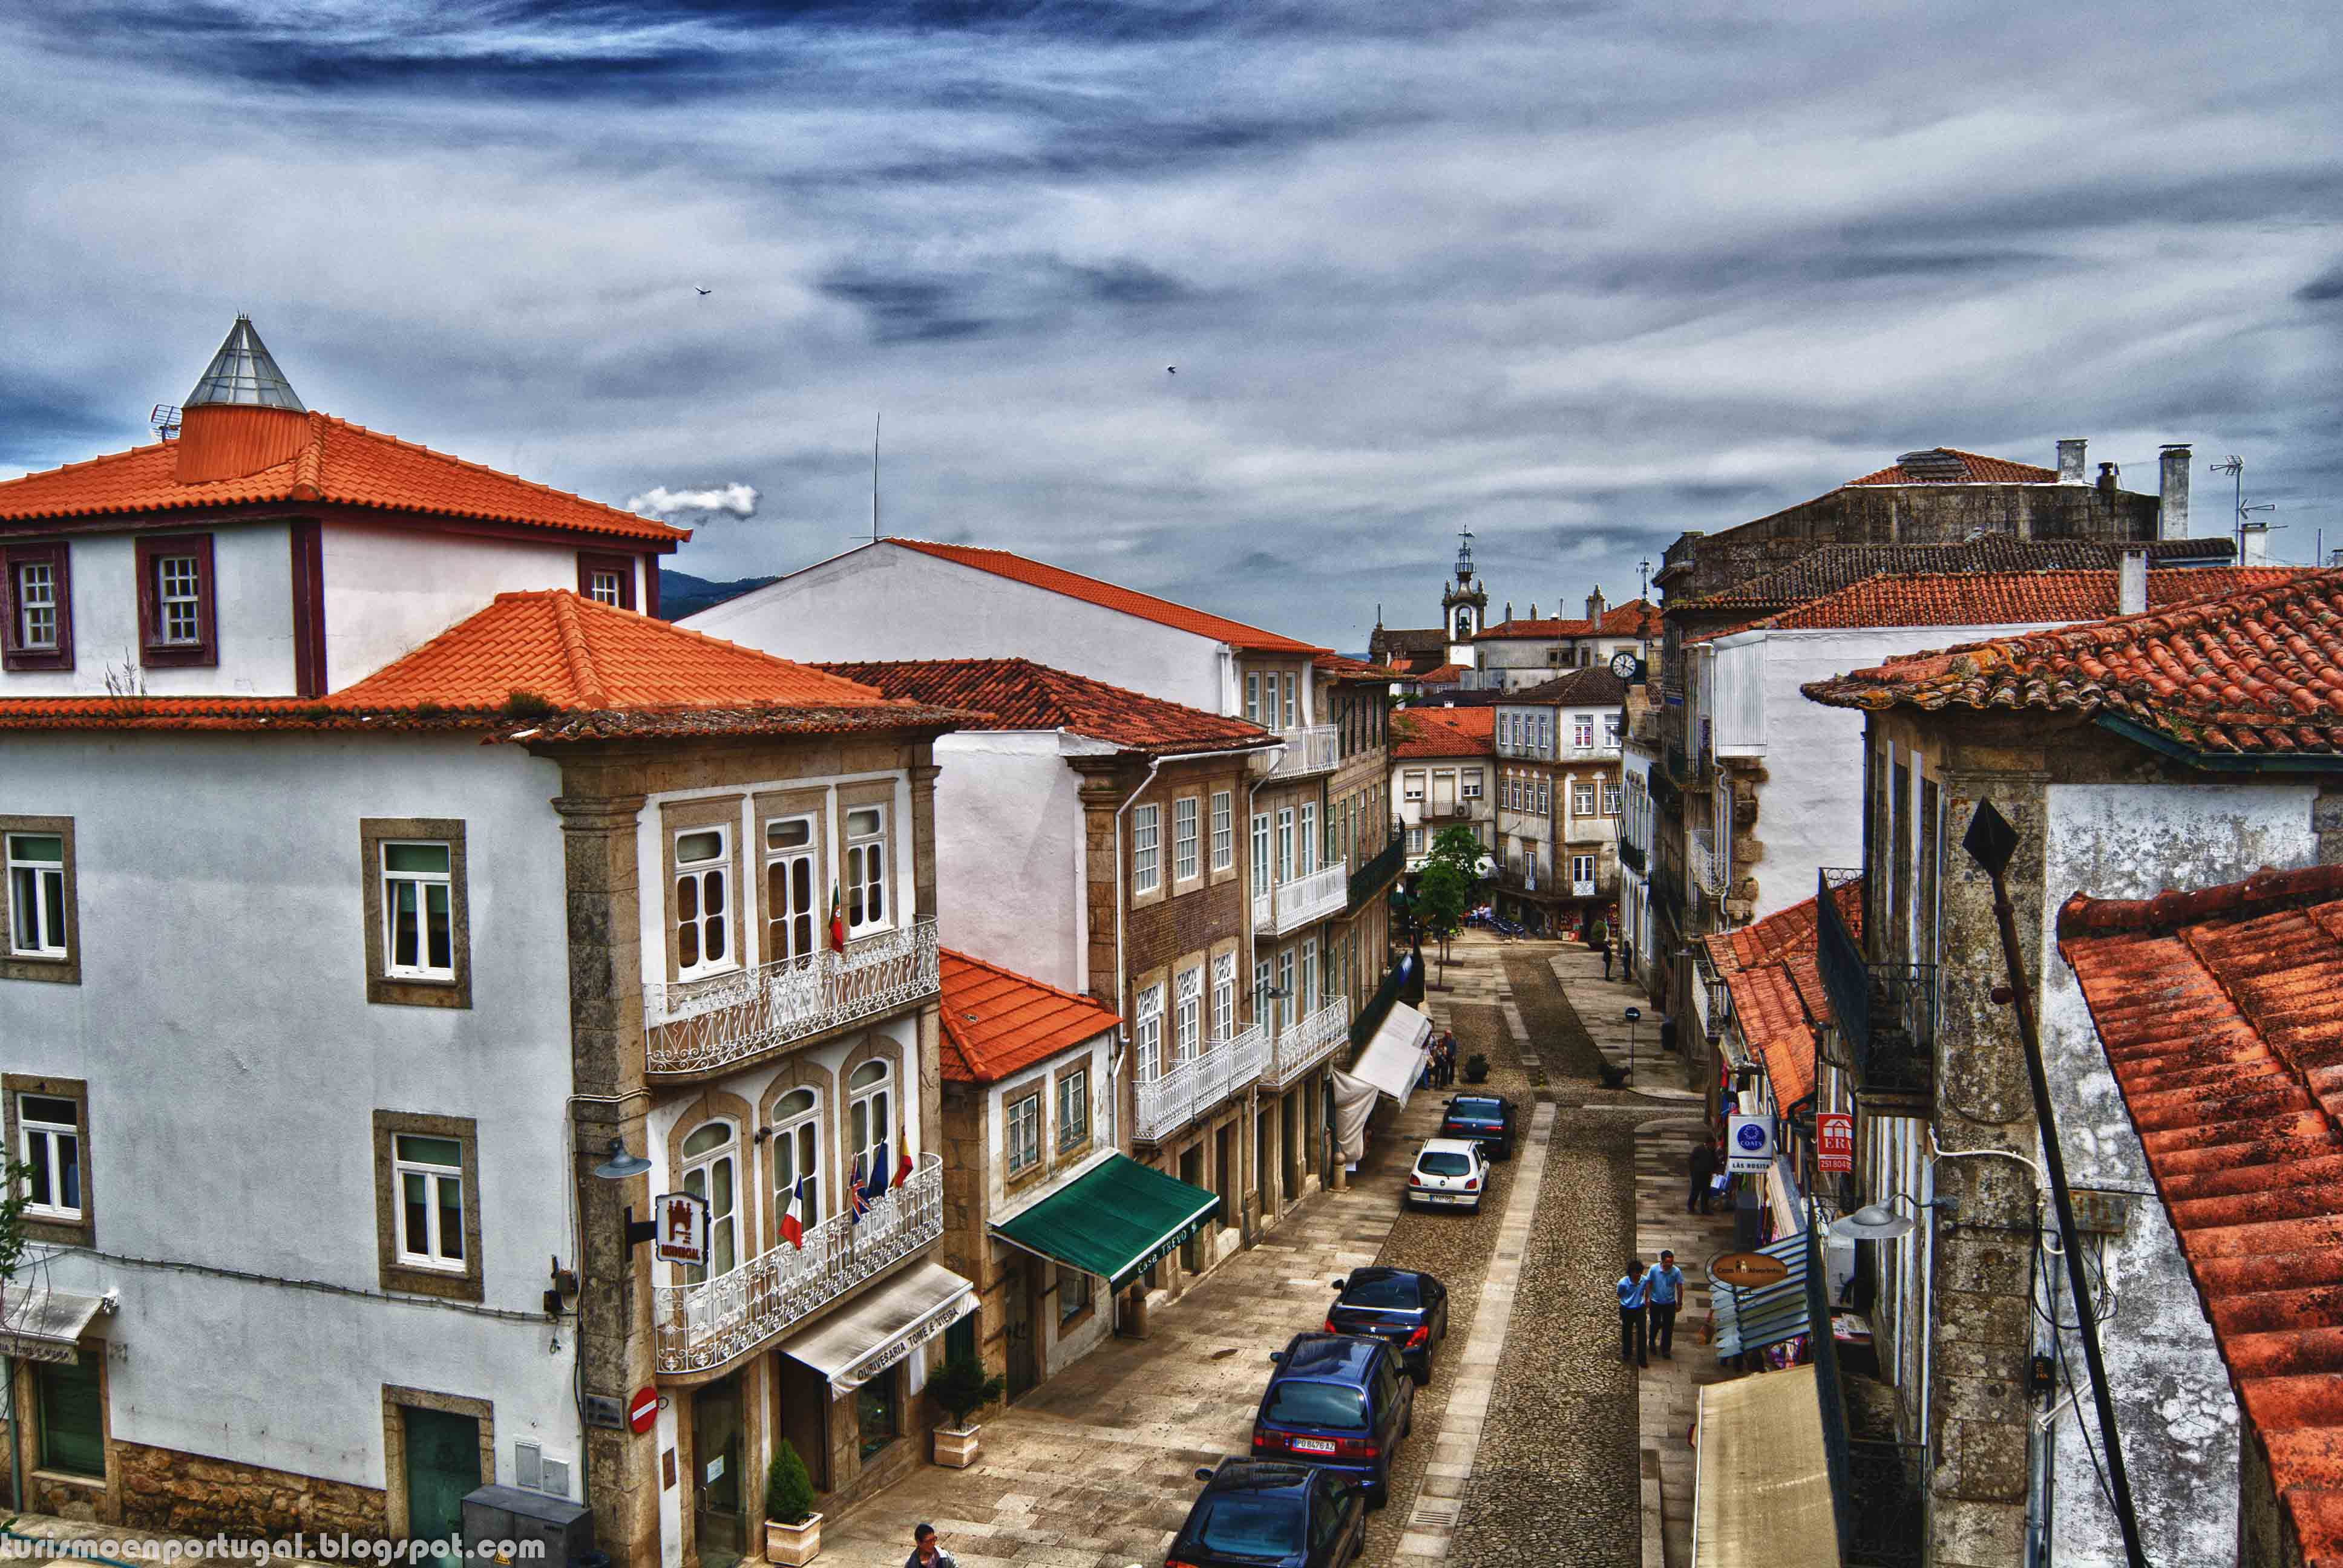 Datei valen a do minho wikipedia for Muebles portugal valenca